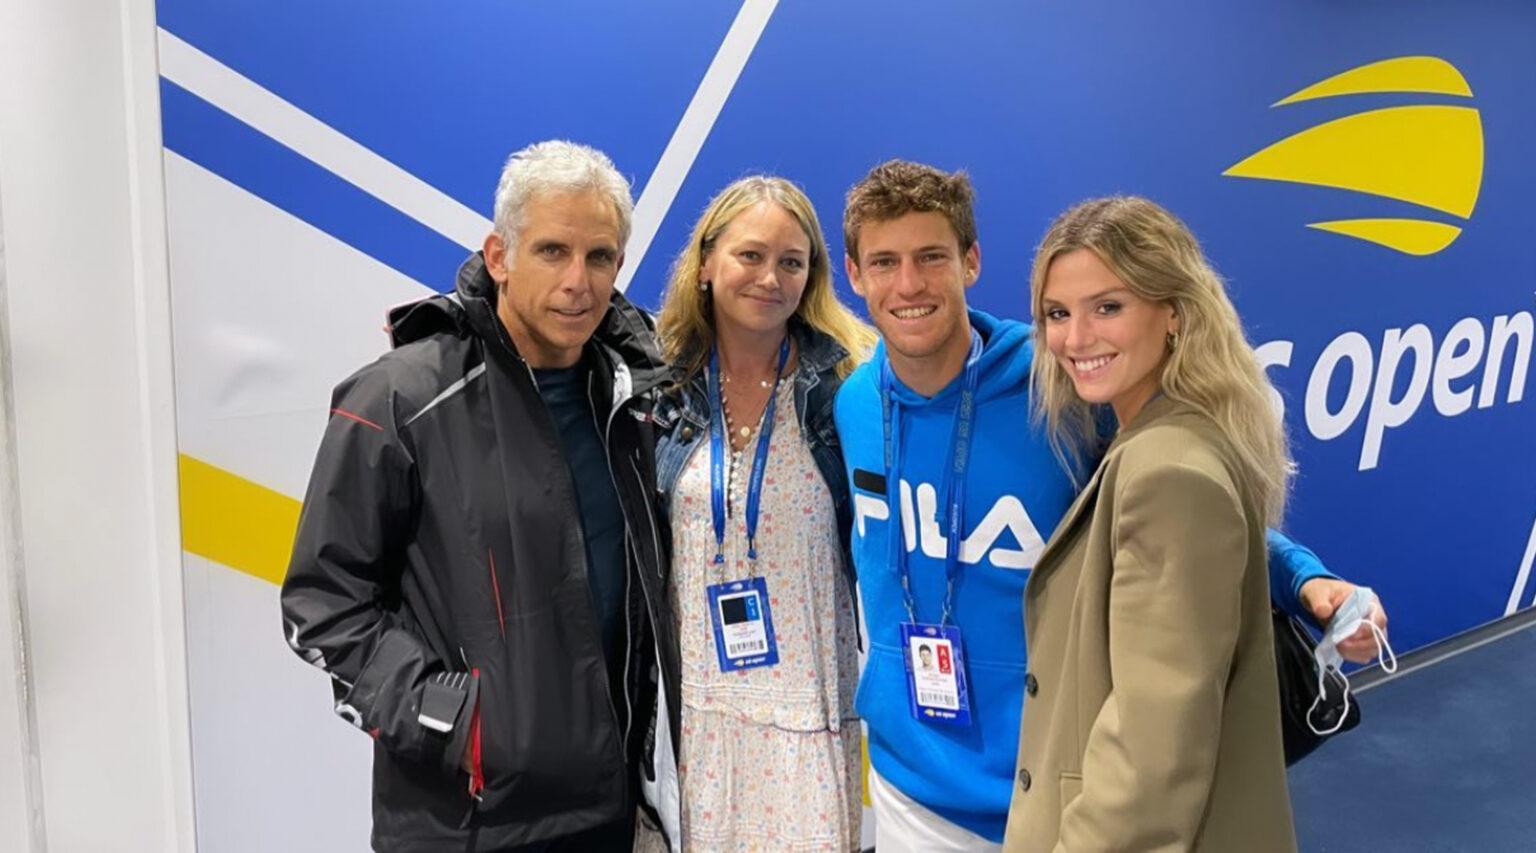 (From left) Ben Stiller, Christine Taylor, Diego Schwartzman and Eugenia De Martino at the U.S. Open in New York. (Photo/JTA via @eugedemartino on Instagram)